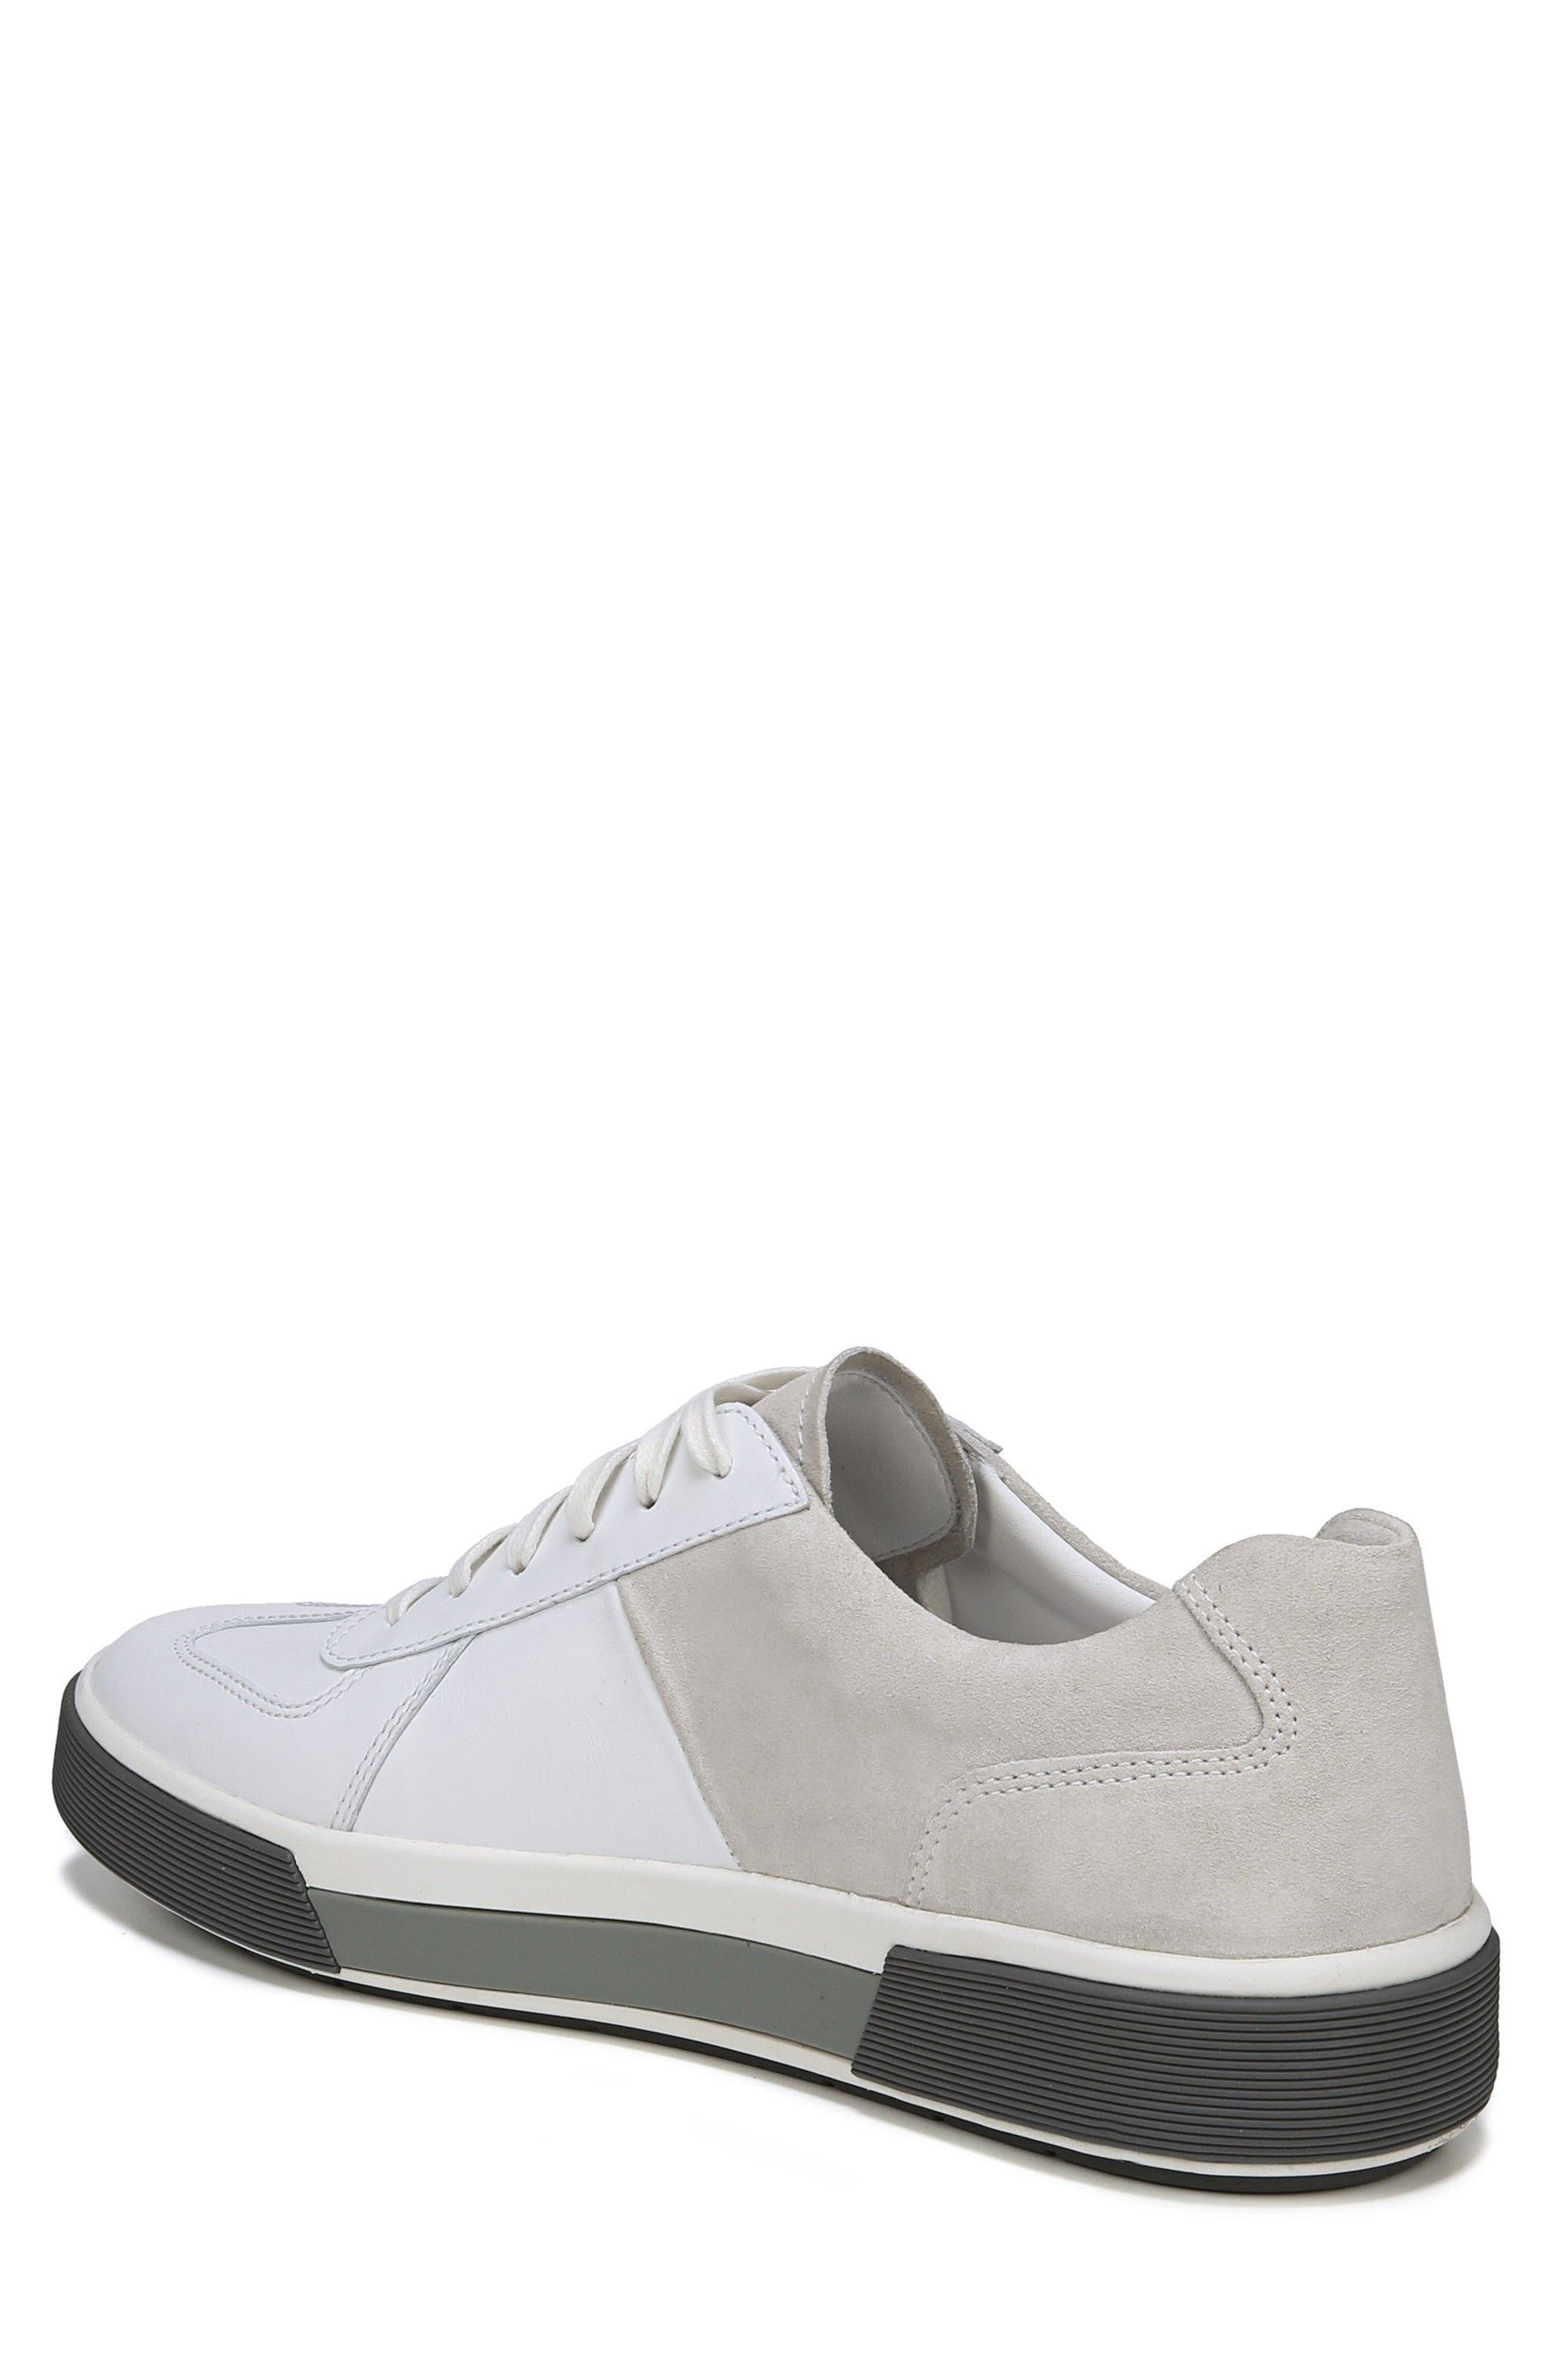 VINCE, Rogue Low Top Sneaker, Alternate thumbnail 2, color, WHITE/ HORCHATA